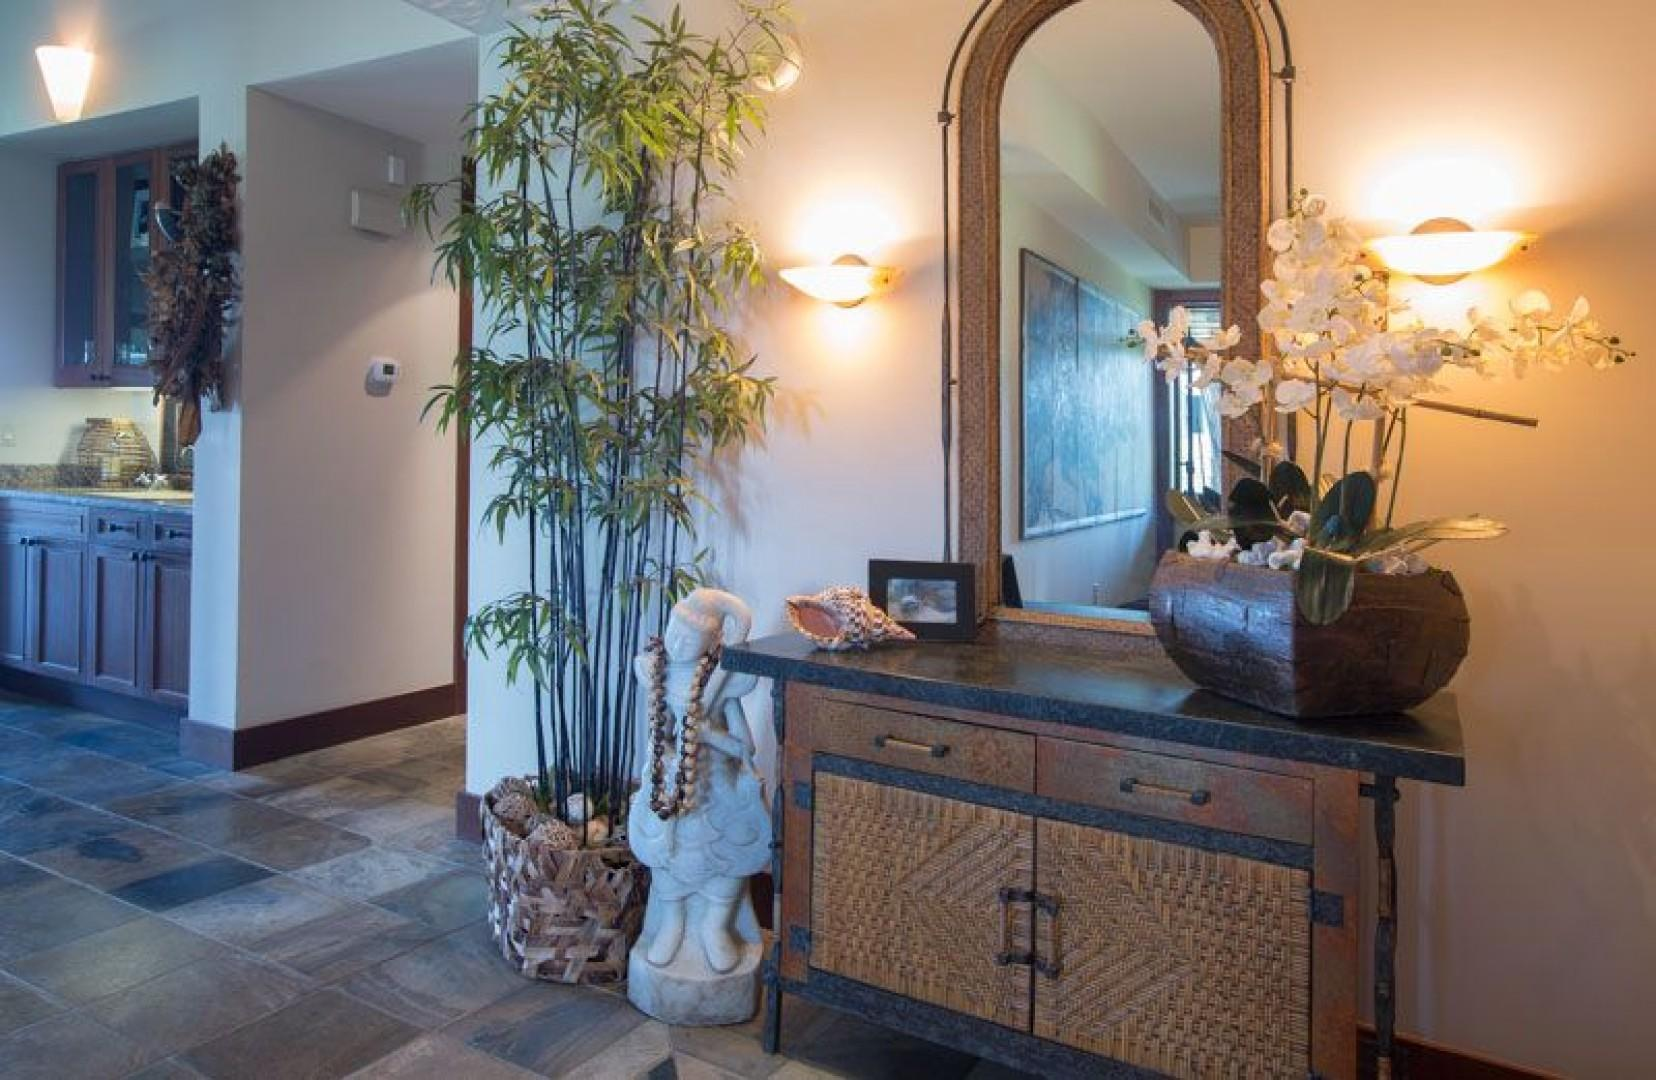 Entry Foyer to this 3 bedroom, 3.5 bath villa